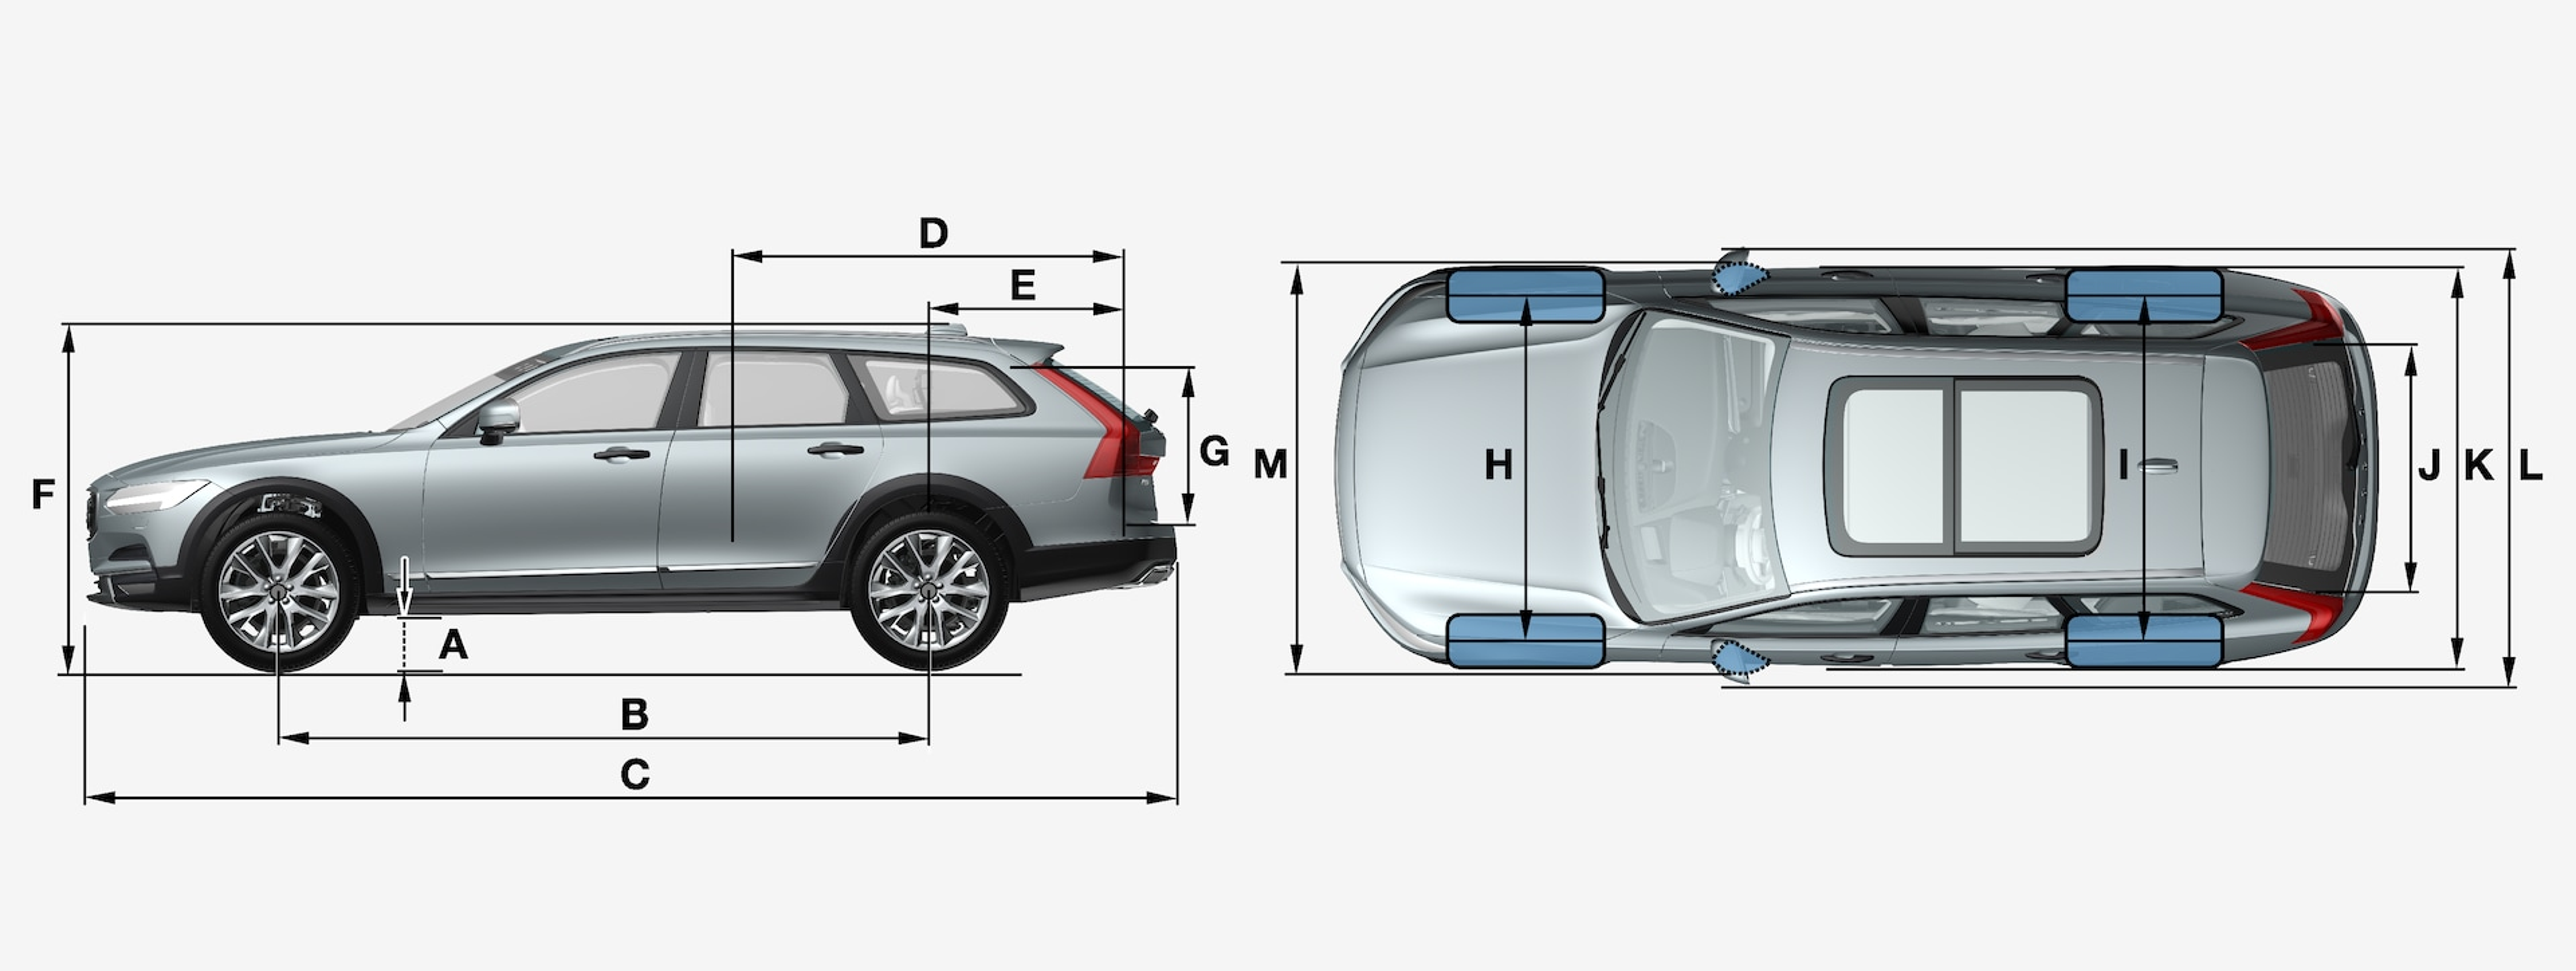 2020 Volvo V90 Specification Pricing